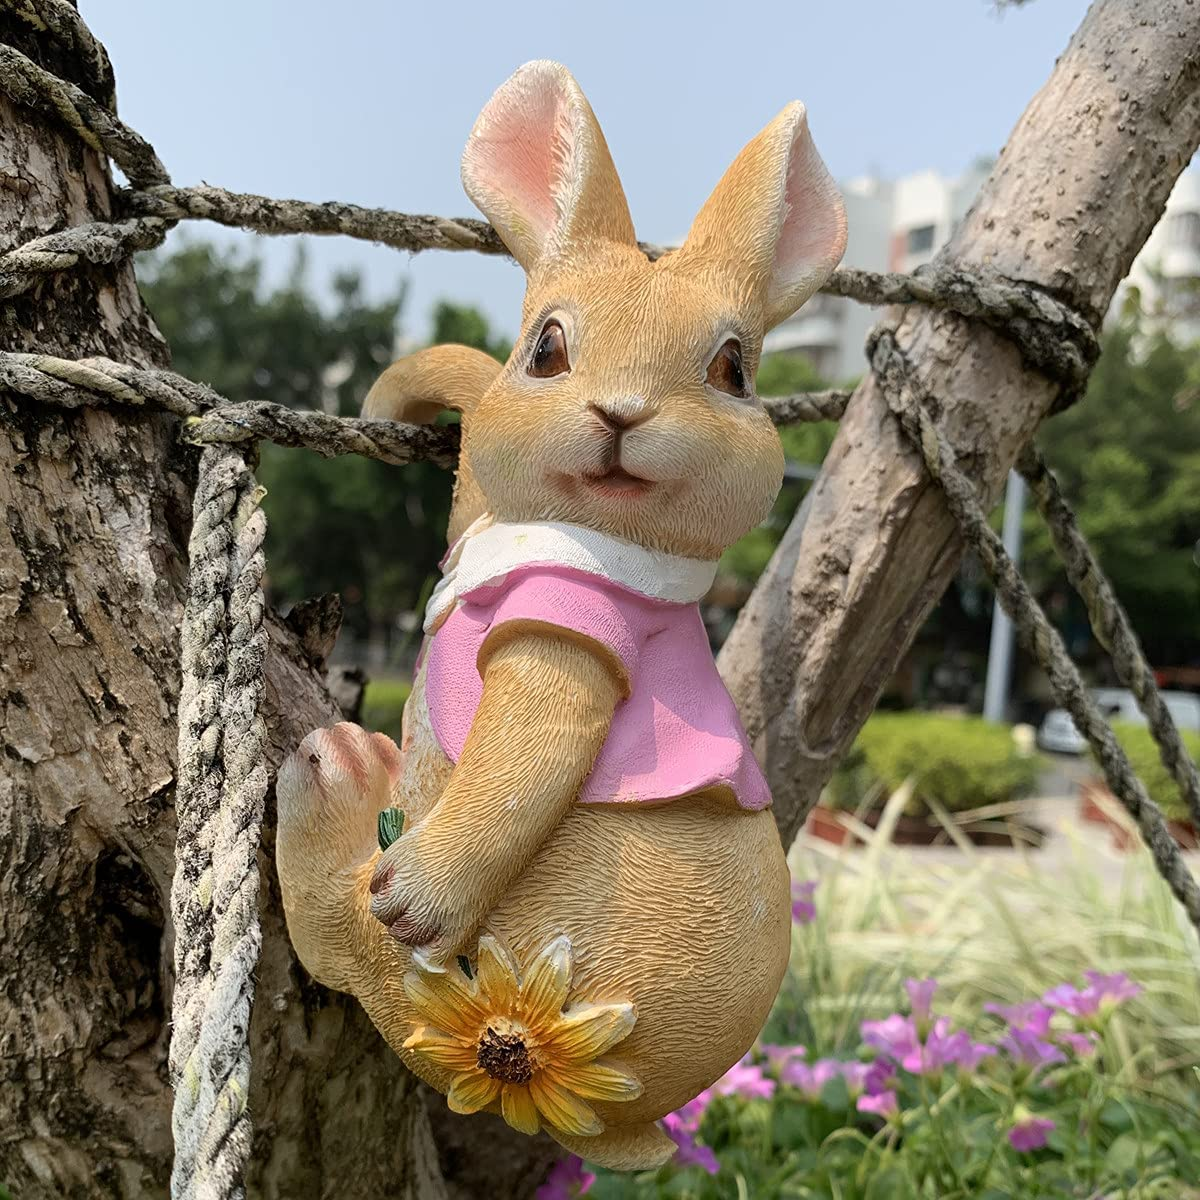 iRonrain Mini Garden Statues Hanging Bunny, Indoor Outdoor Decorations Cute Rabbit Art Décor Figurine Ornament for Yard Home Garden Patio and Office (Pink)